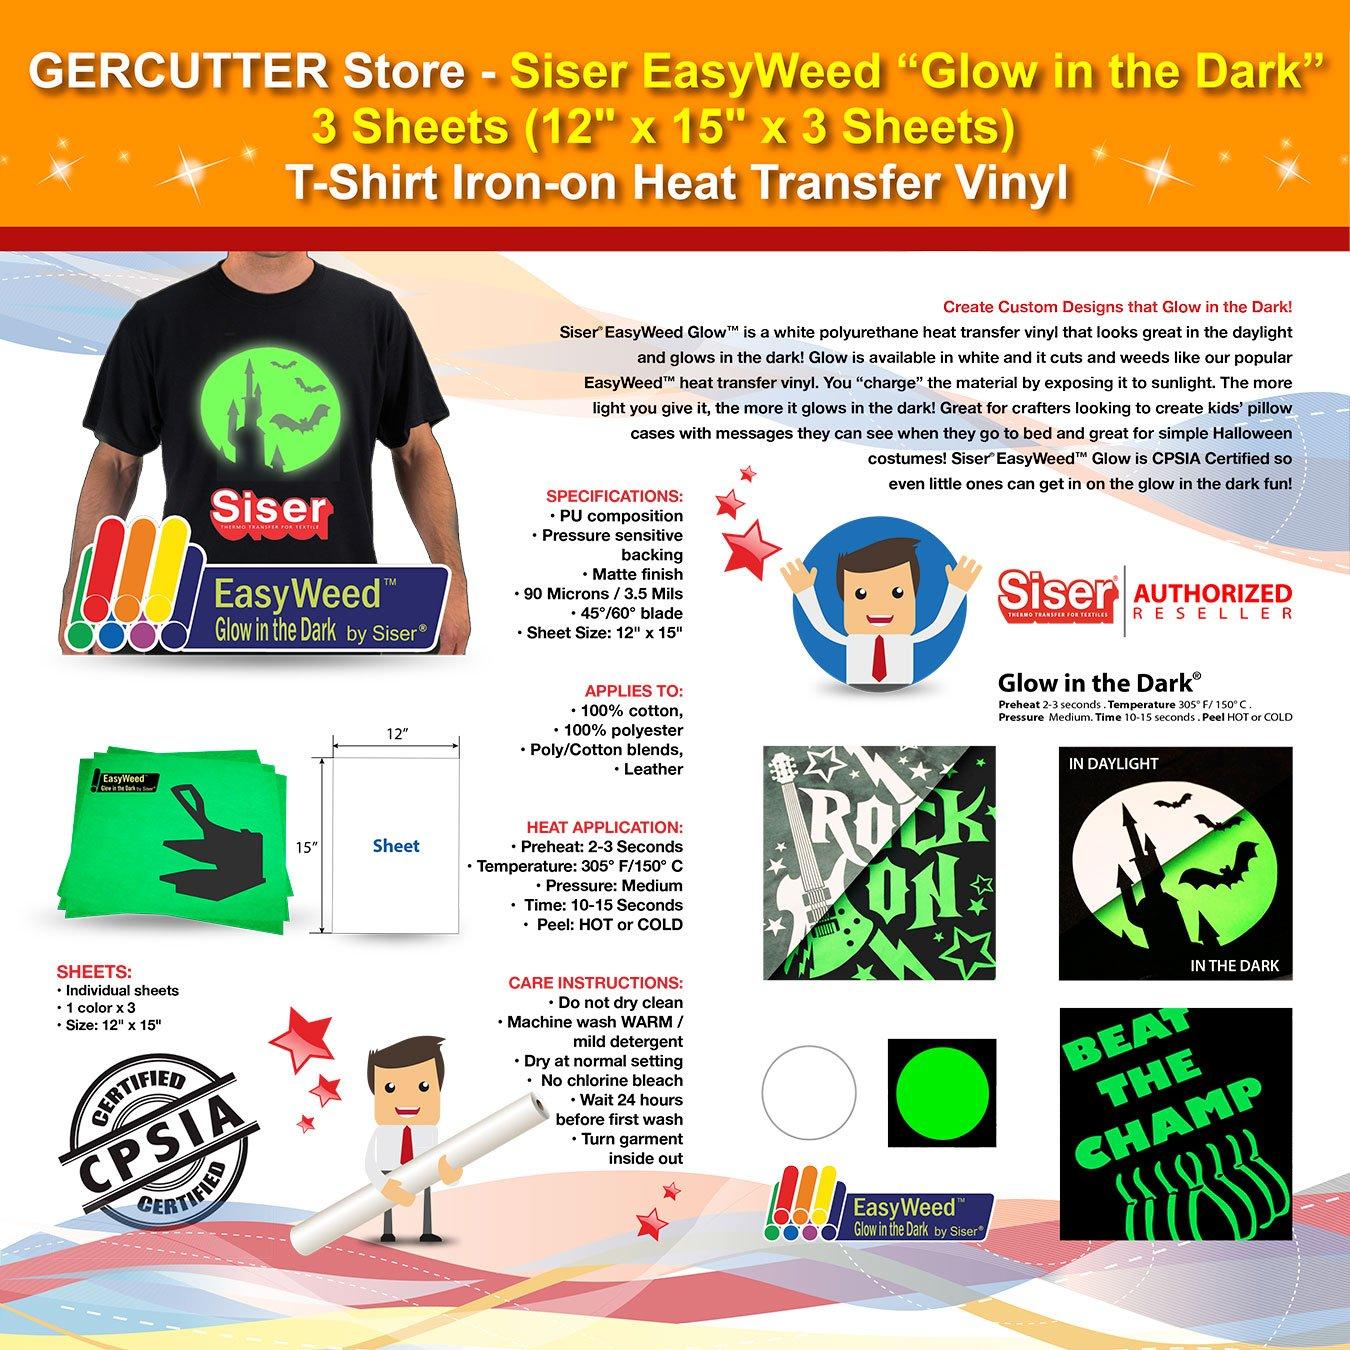 siser easyweed - gercutter Store - siser easyweed